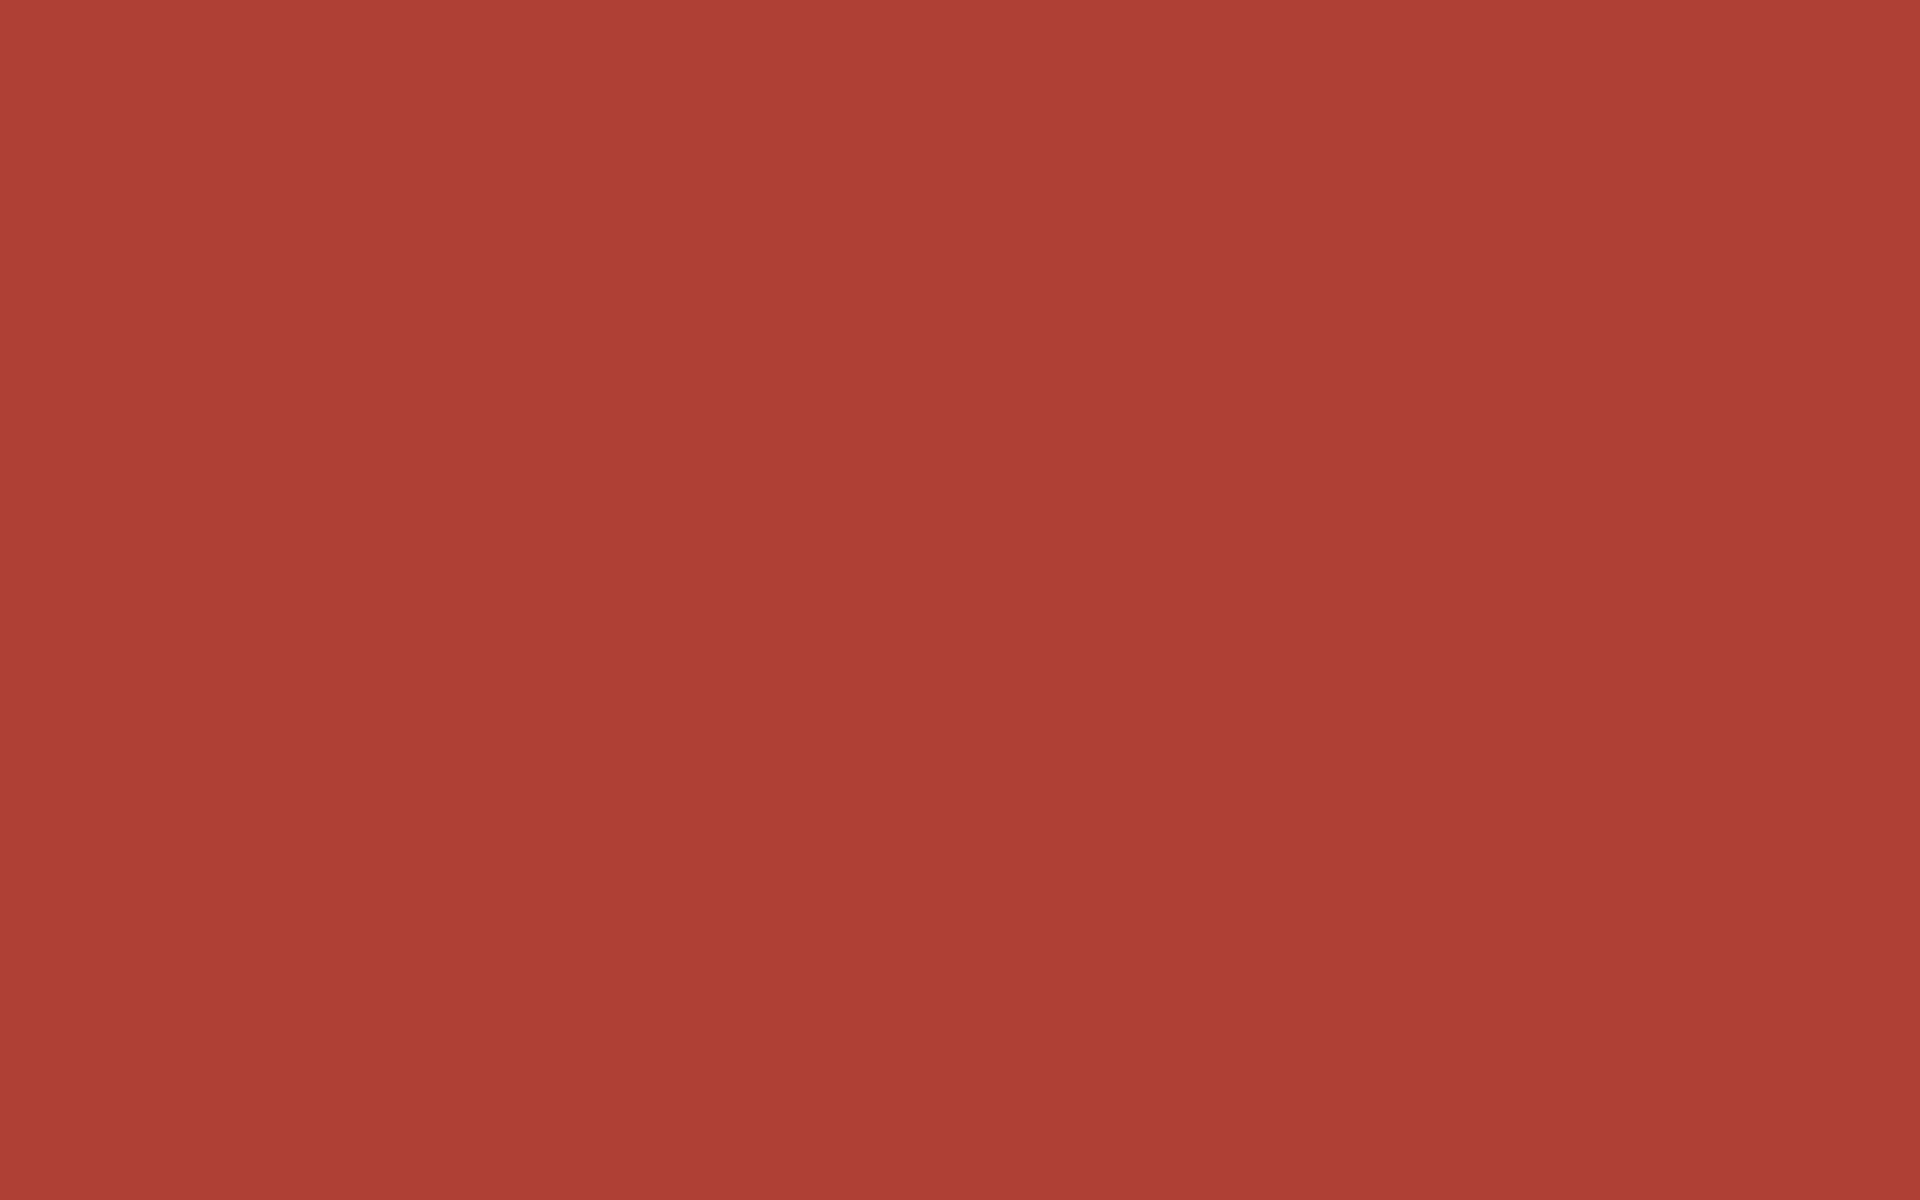 1920x1200 Pale Carmine Solid Color Background